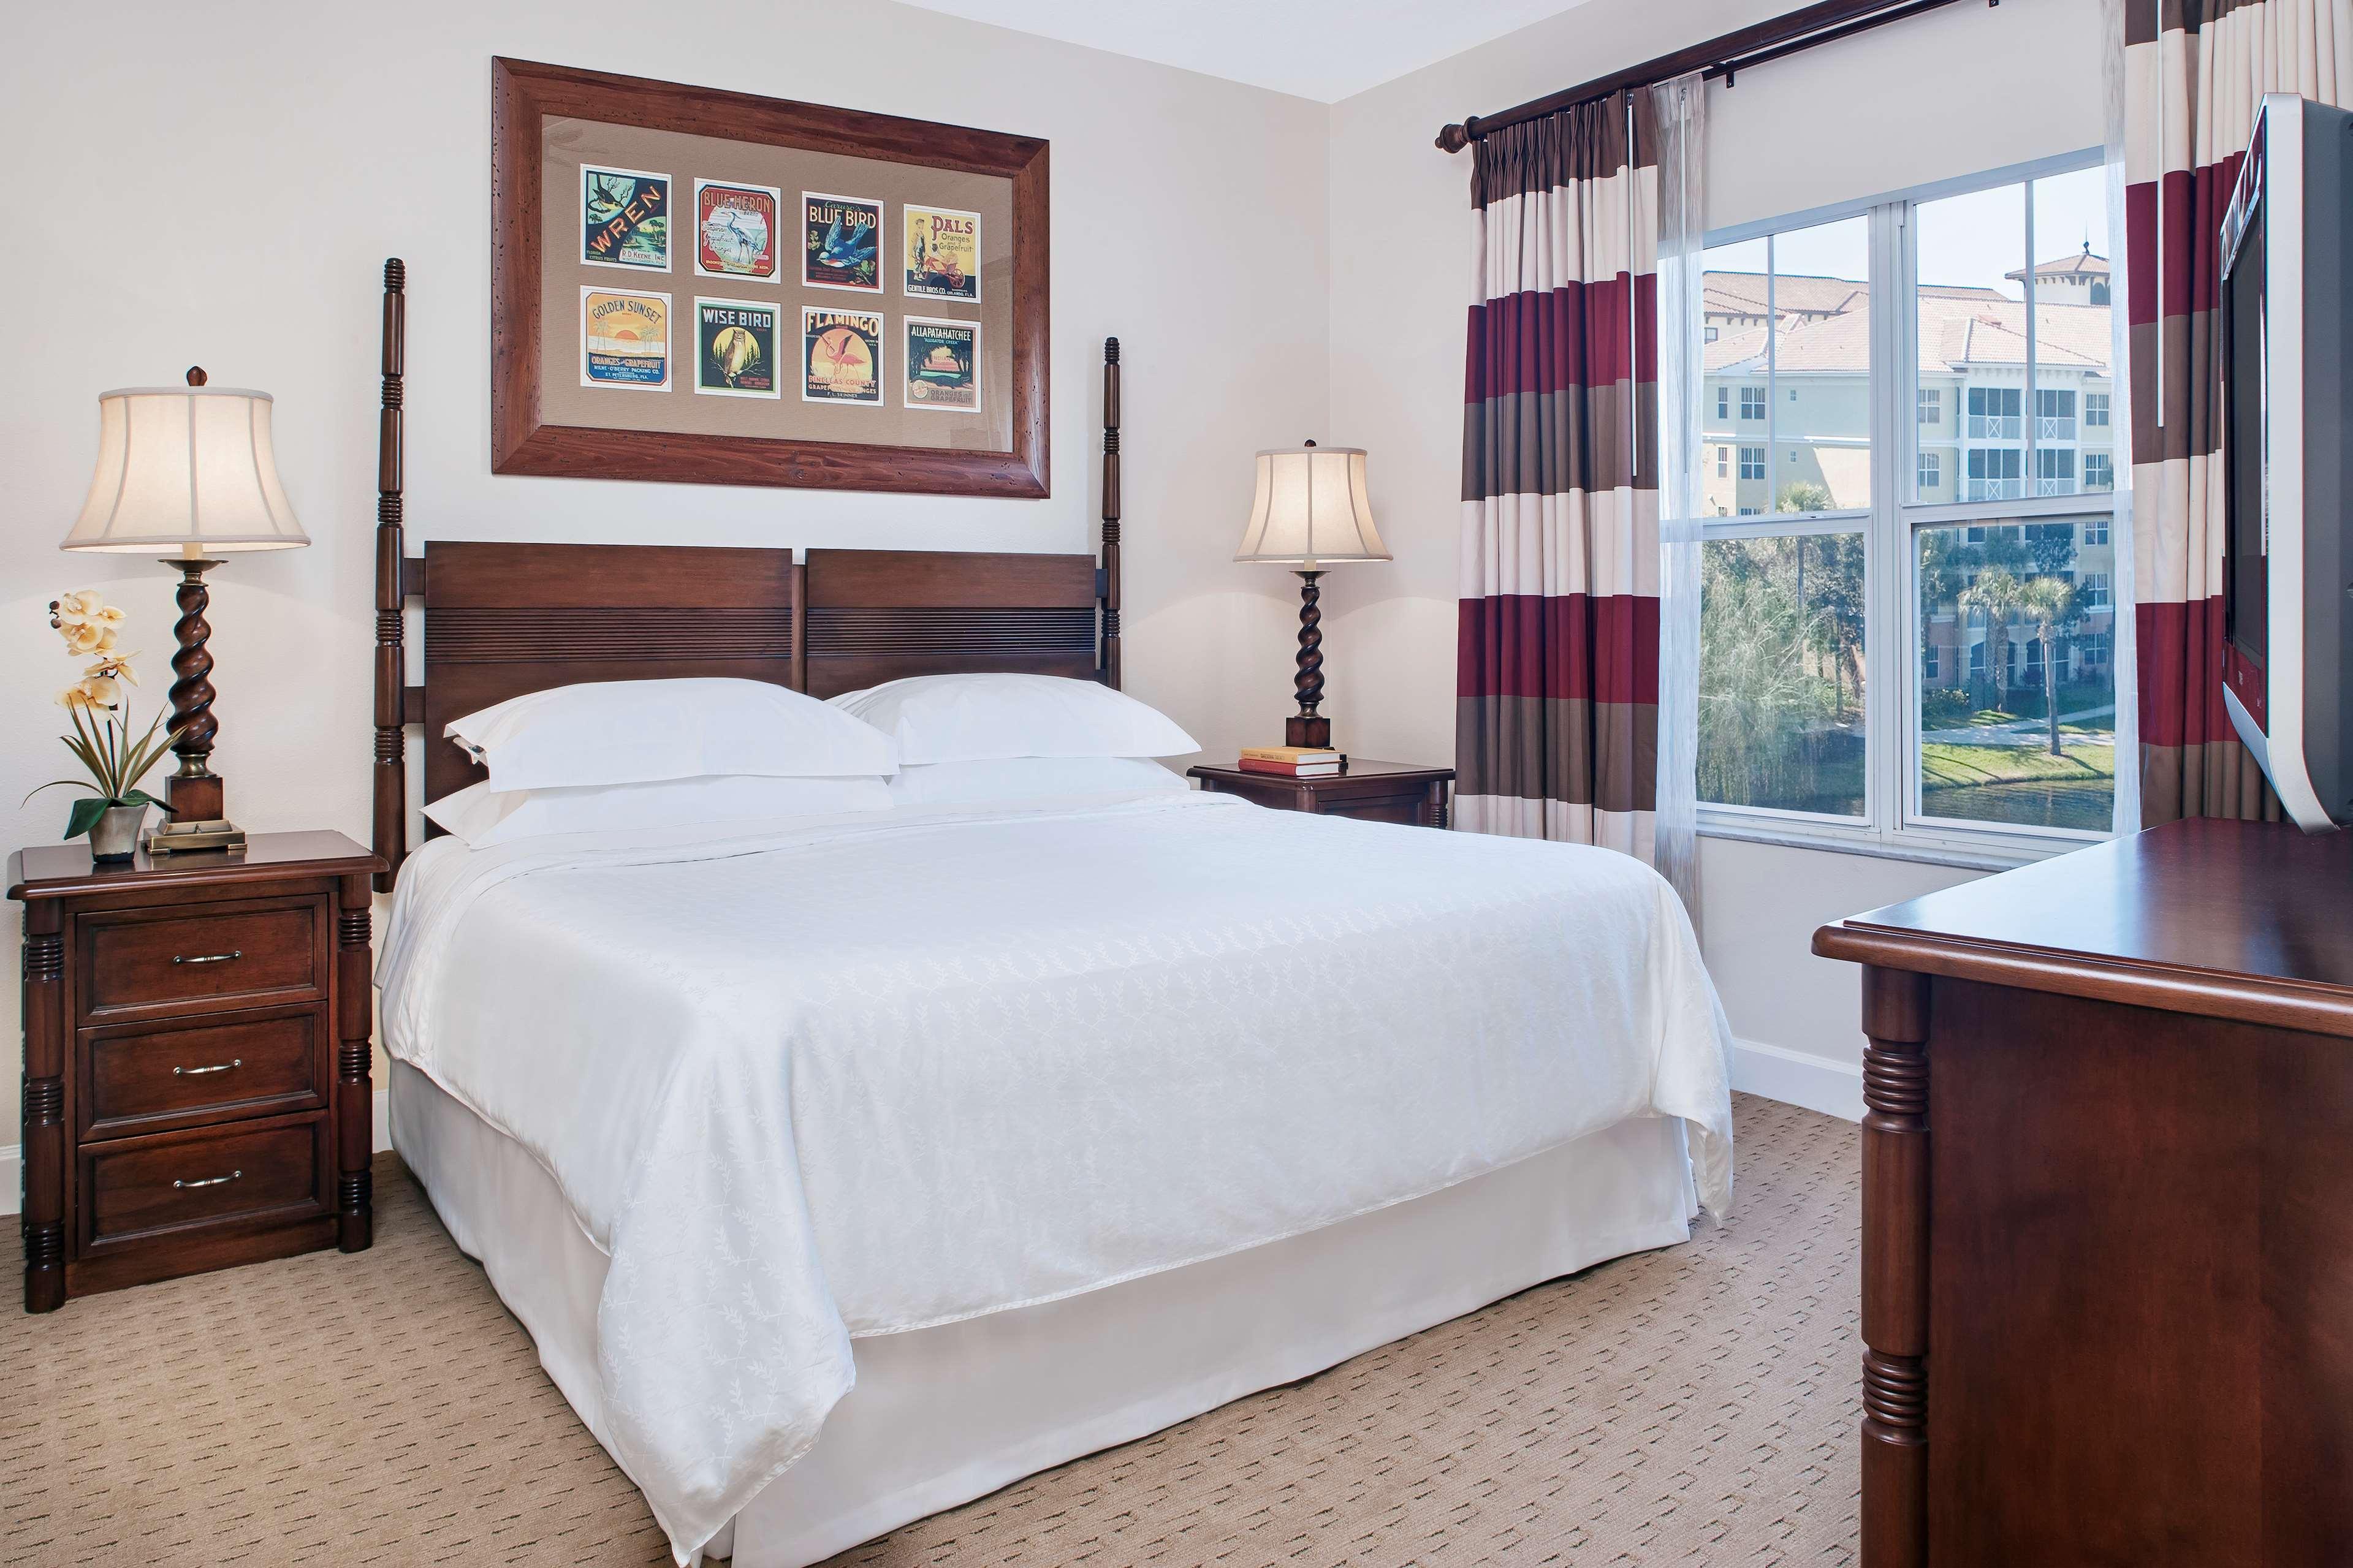 Amelia Phase Bedroom